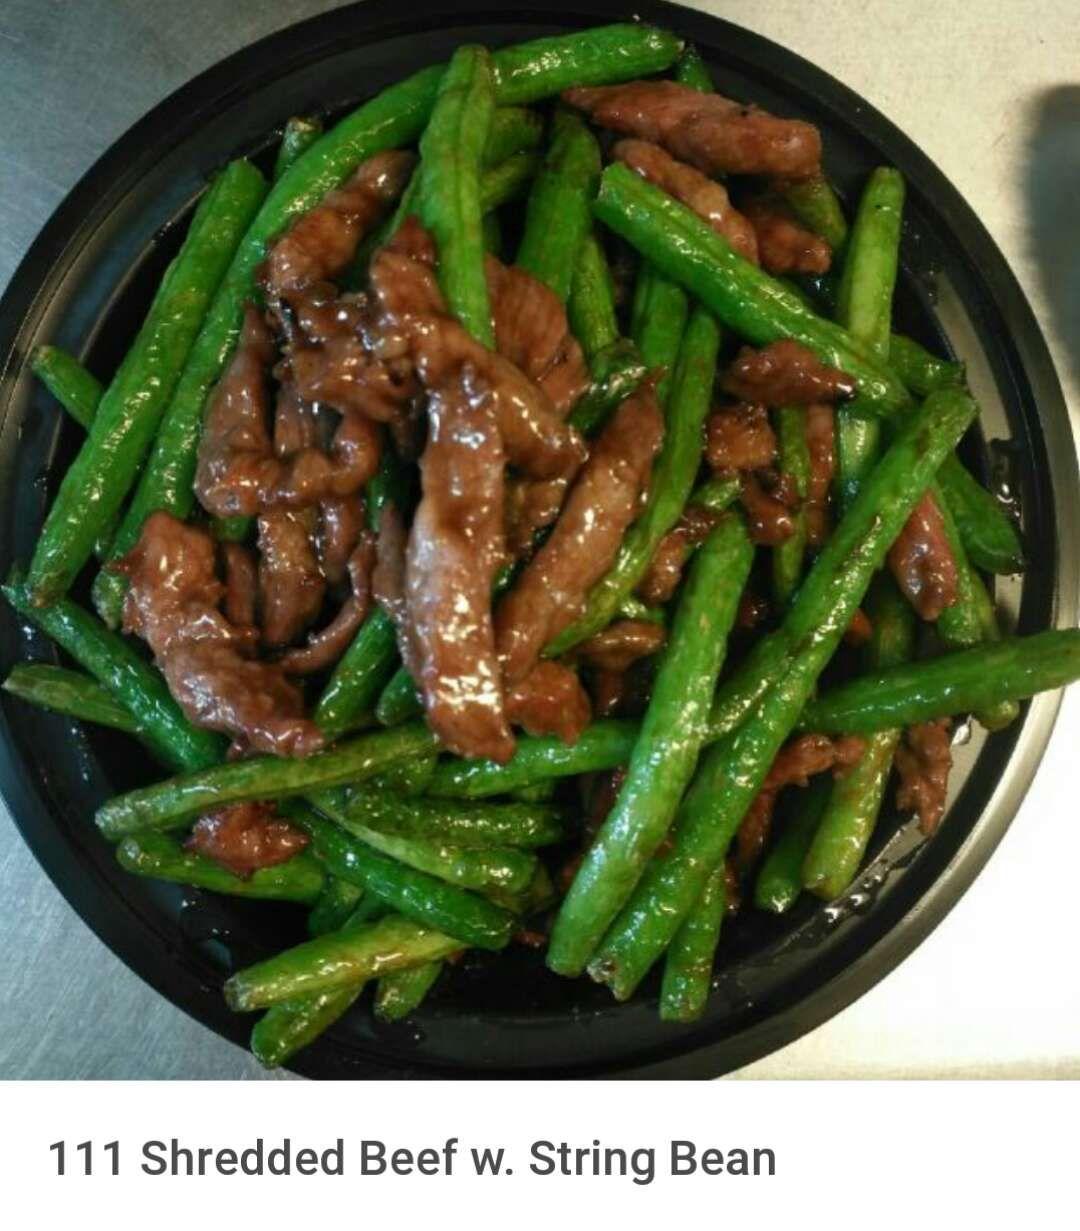 111. Shredded Beef w. String Bean Image